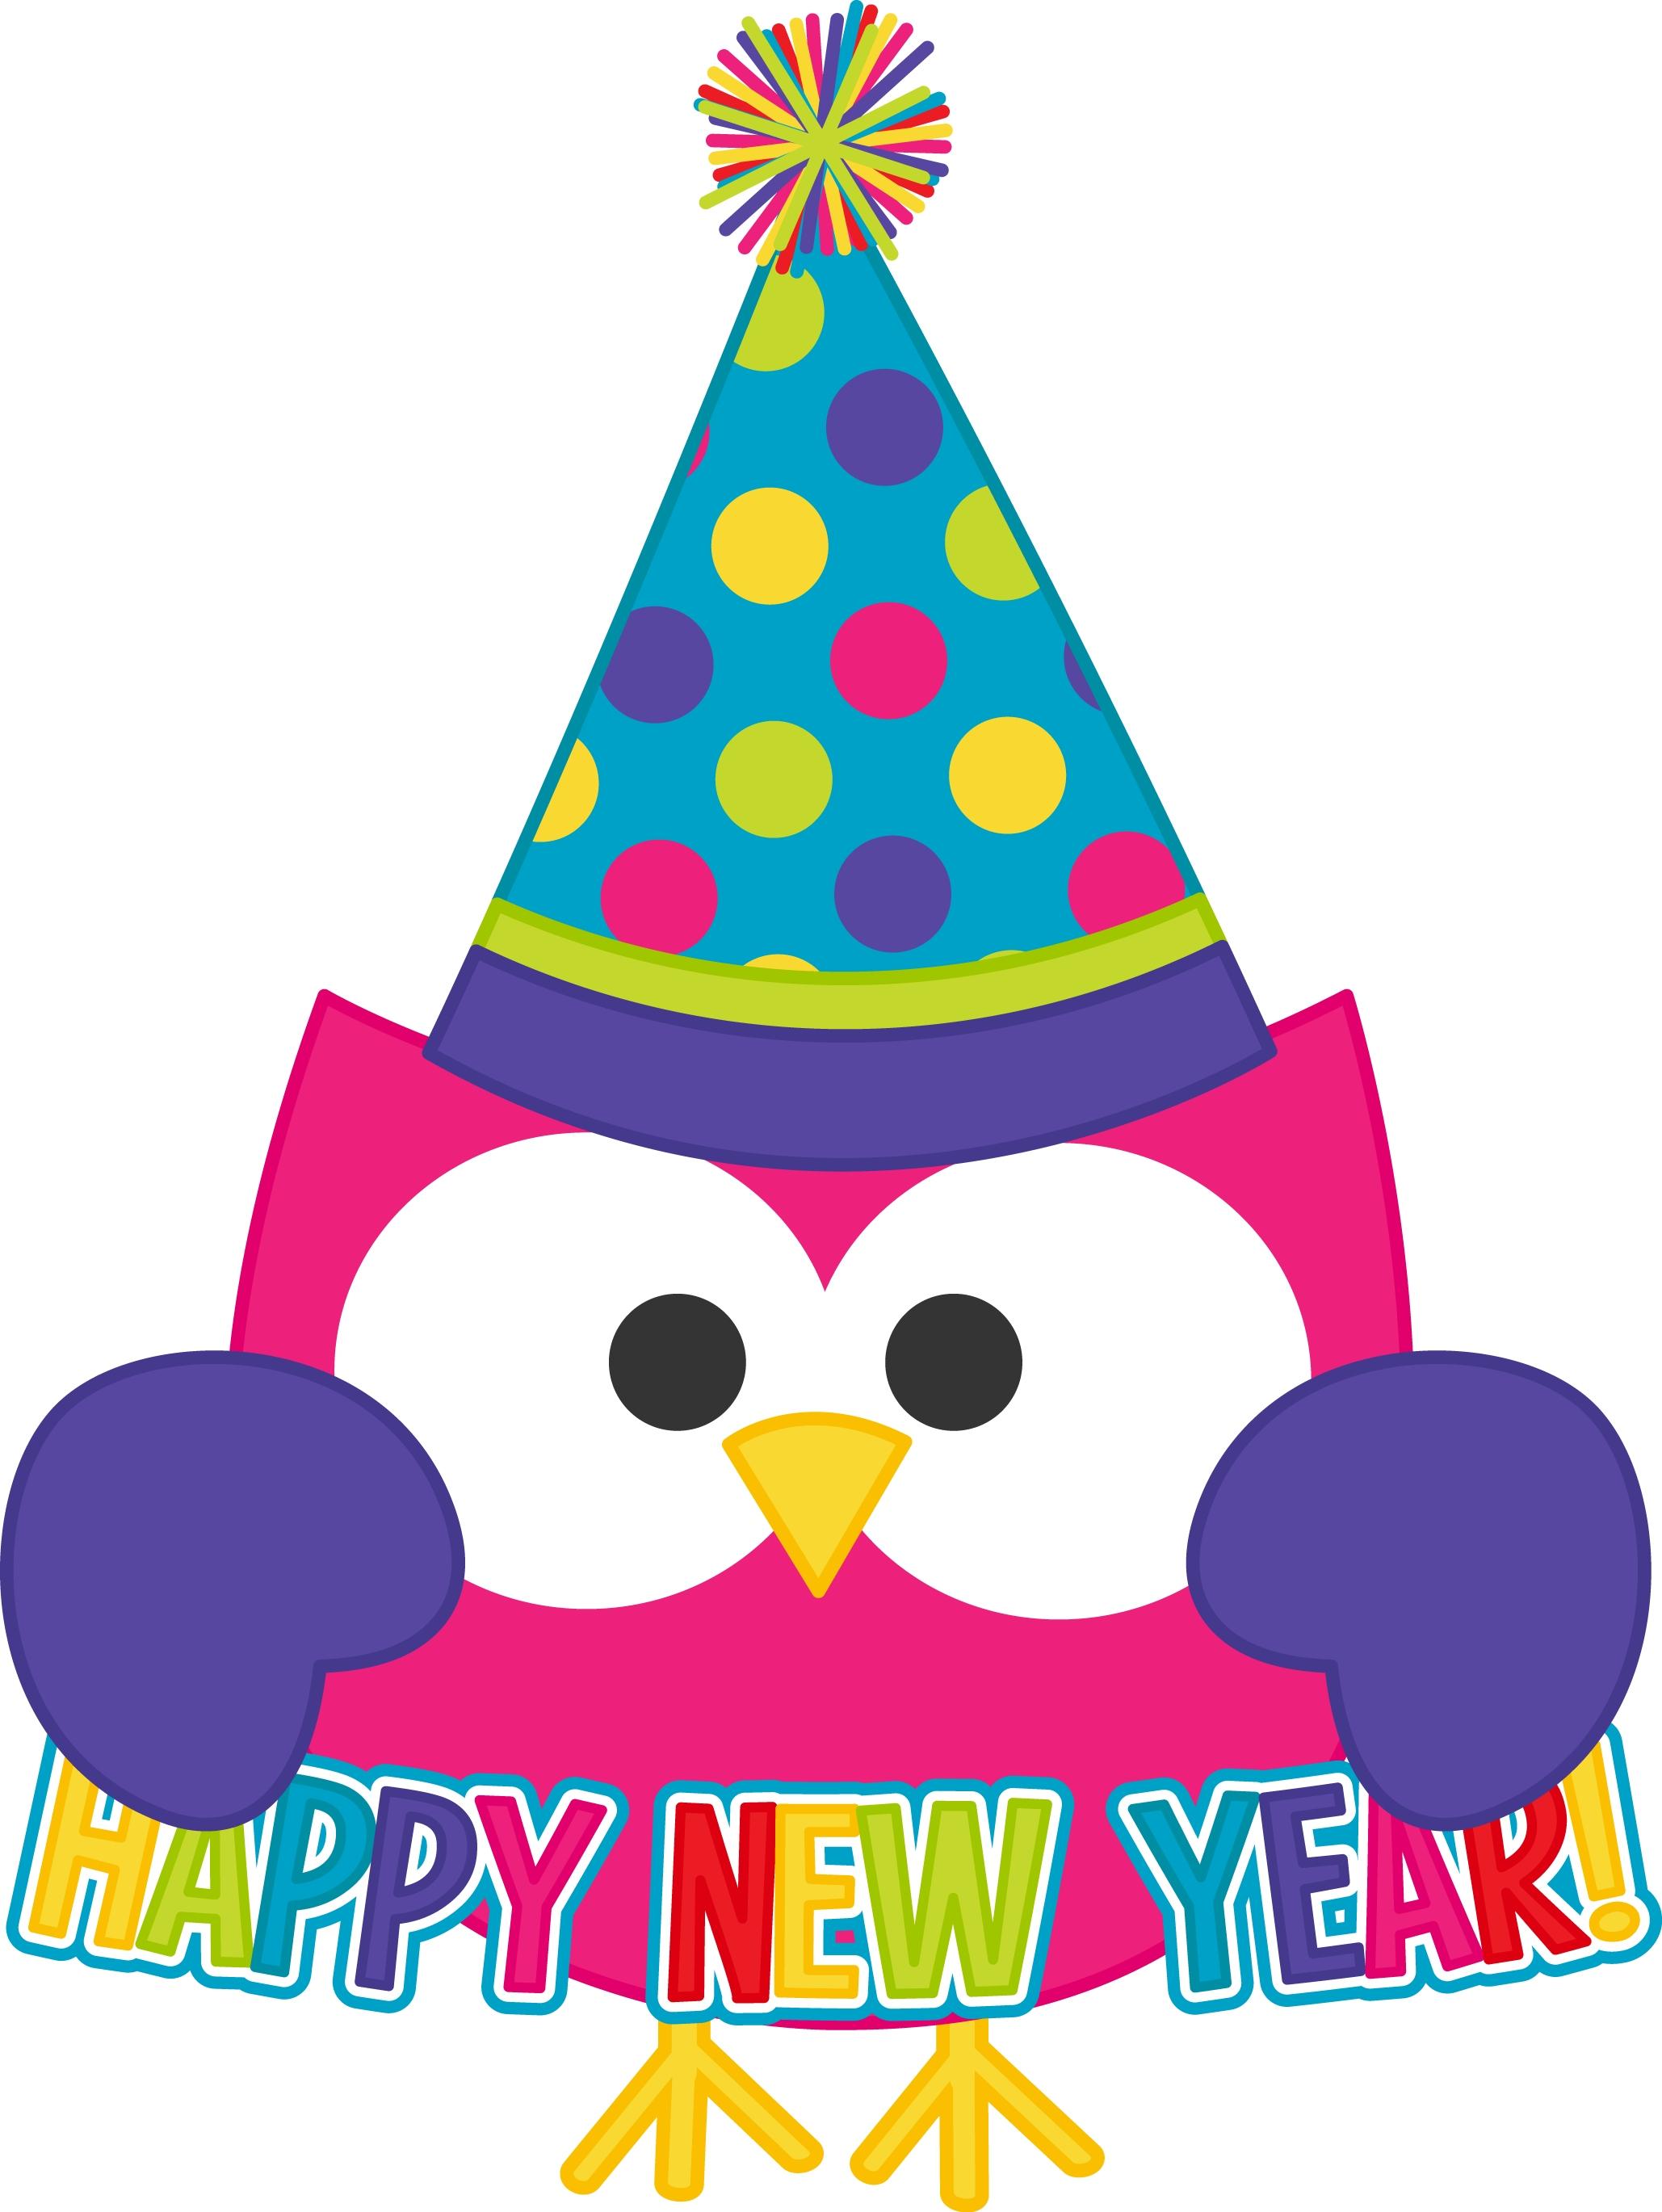 Happy New Year 2017 Free Cute .-Happy New Year 2017 Free Cute .-14